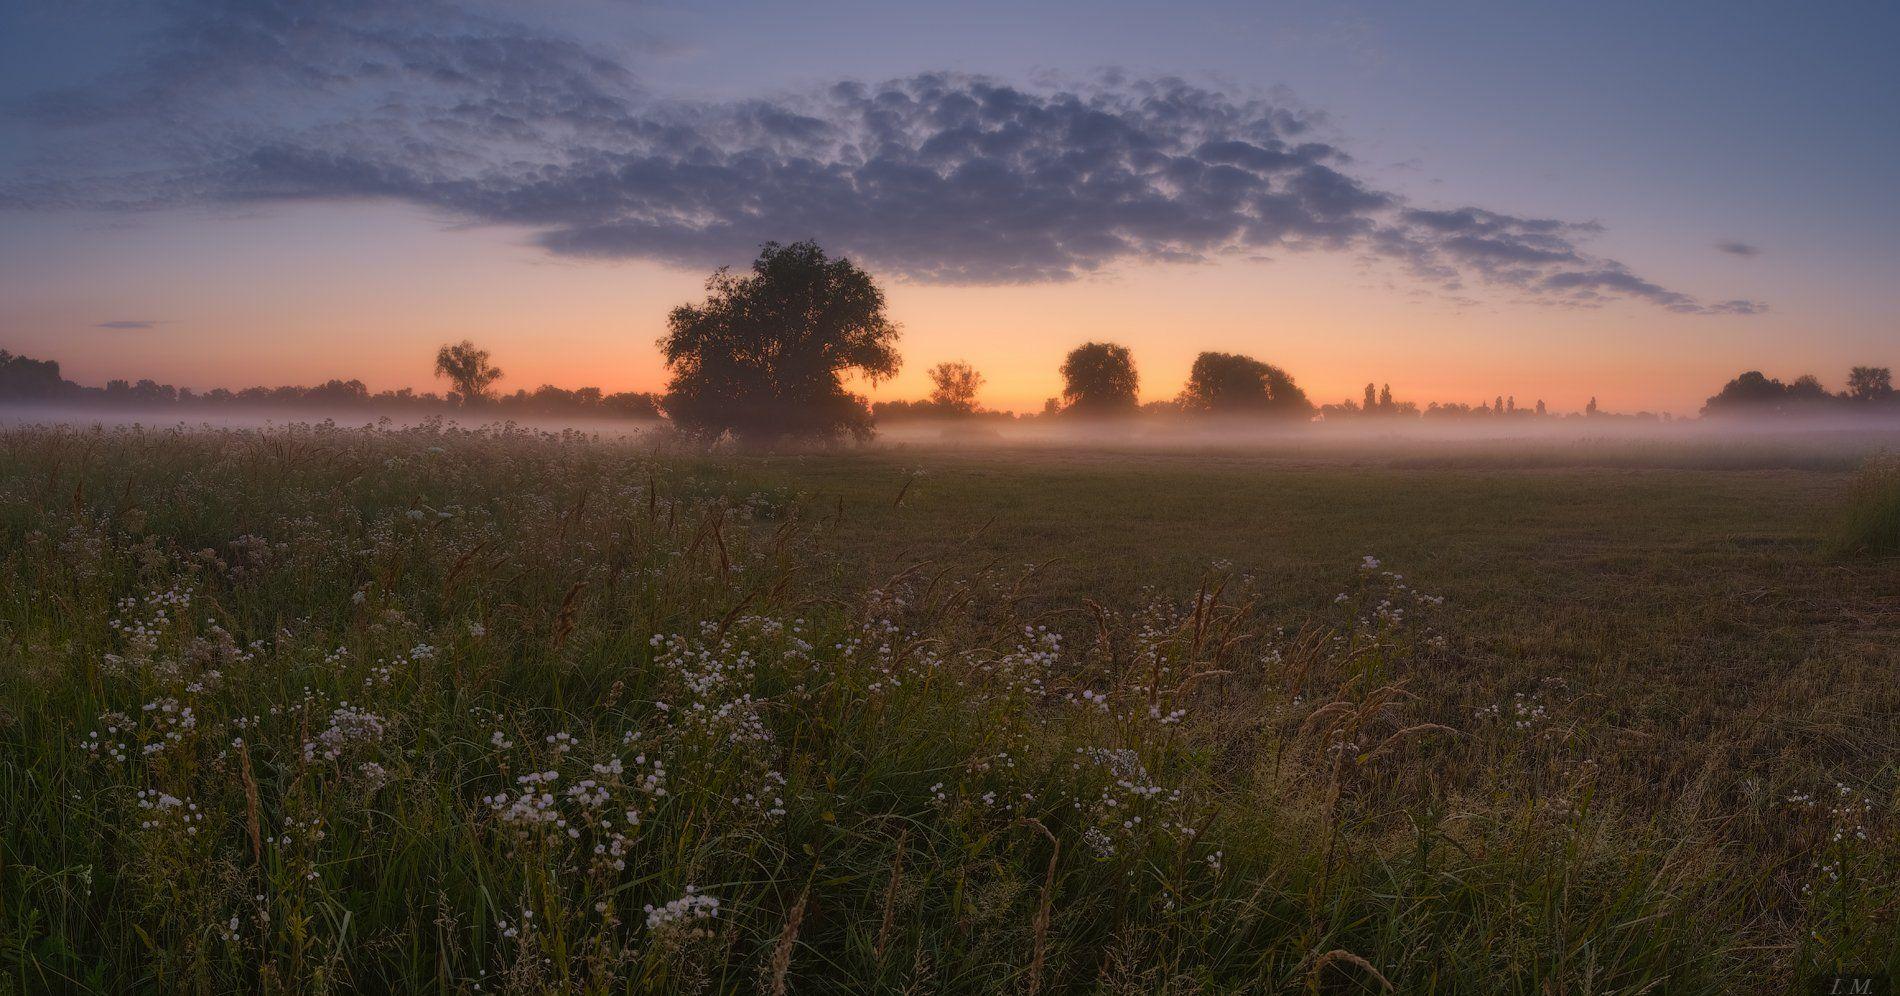 утро, рассвет, сумерки, туман, облака, лето, июль, луг, свет, панорама, пейзаж, sunrise, idyllic, dawn, horizon, dramatic sky, moody sky, tranquility, grass, sky, clouds, summer, green, outdoors, tree, light, morning, sunlight, beautiful, fog, misty, glow, Ivan Maljarenko